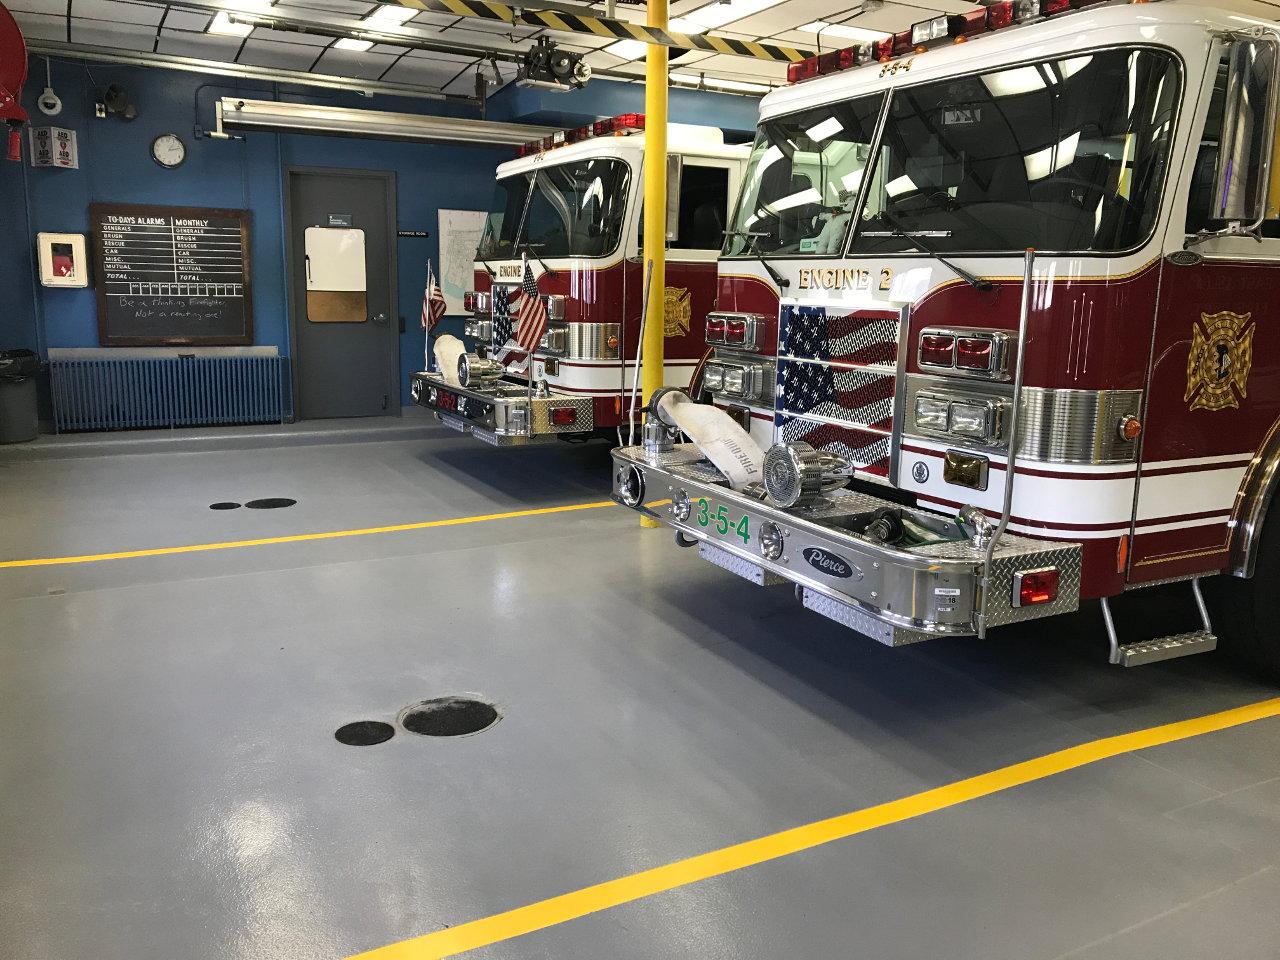 firehouse-1